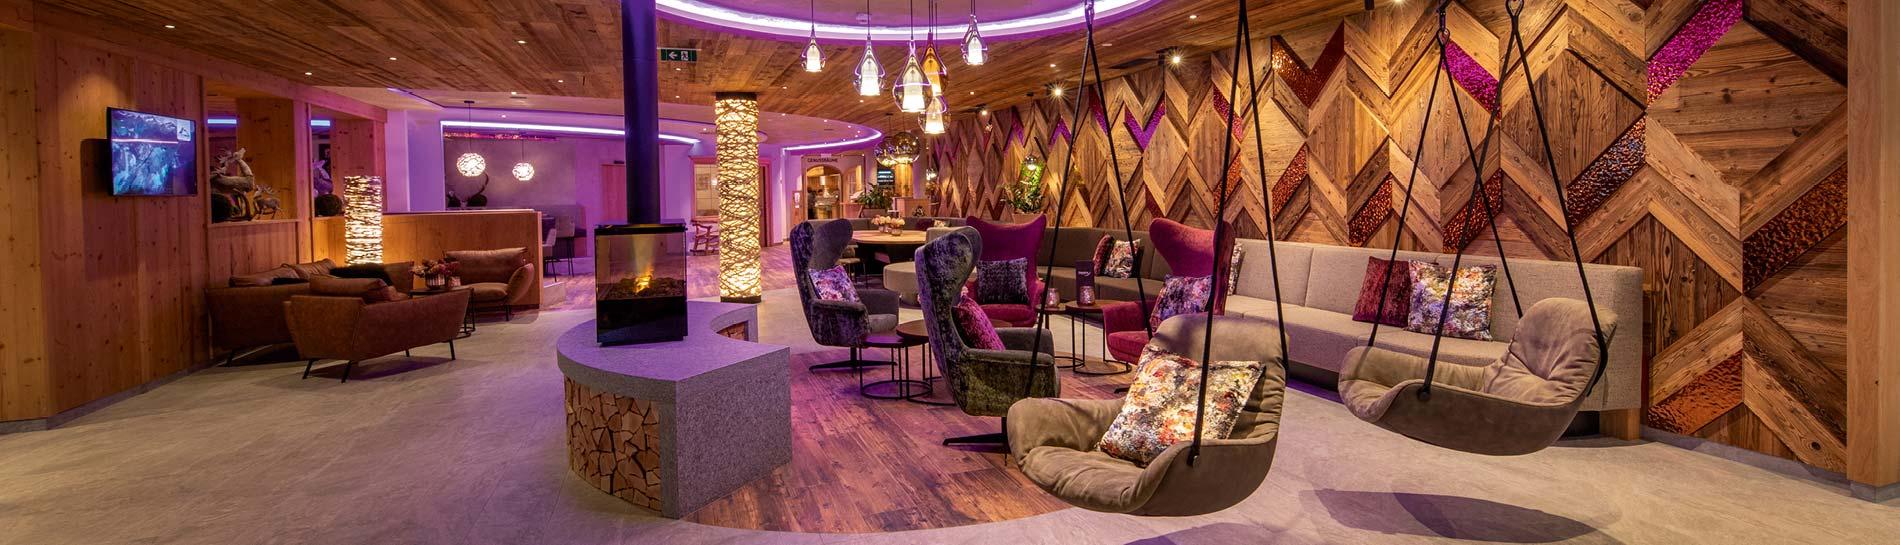 Sportresort Alpenblick Hotel Zell am See Austria Keyfotos Niche Destinations